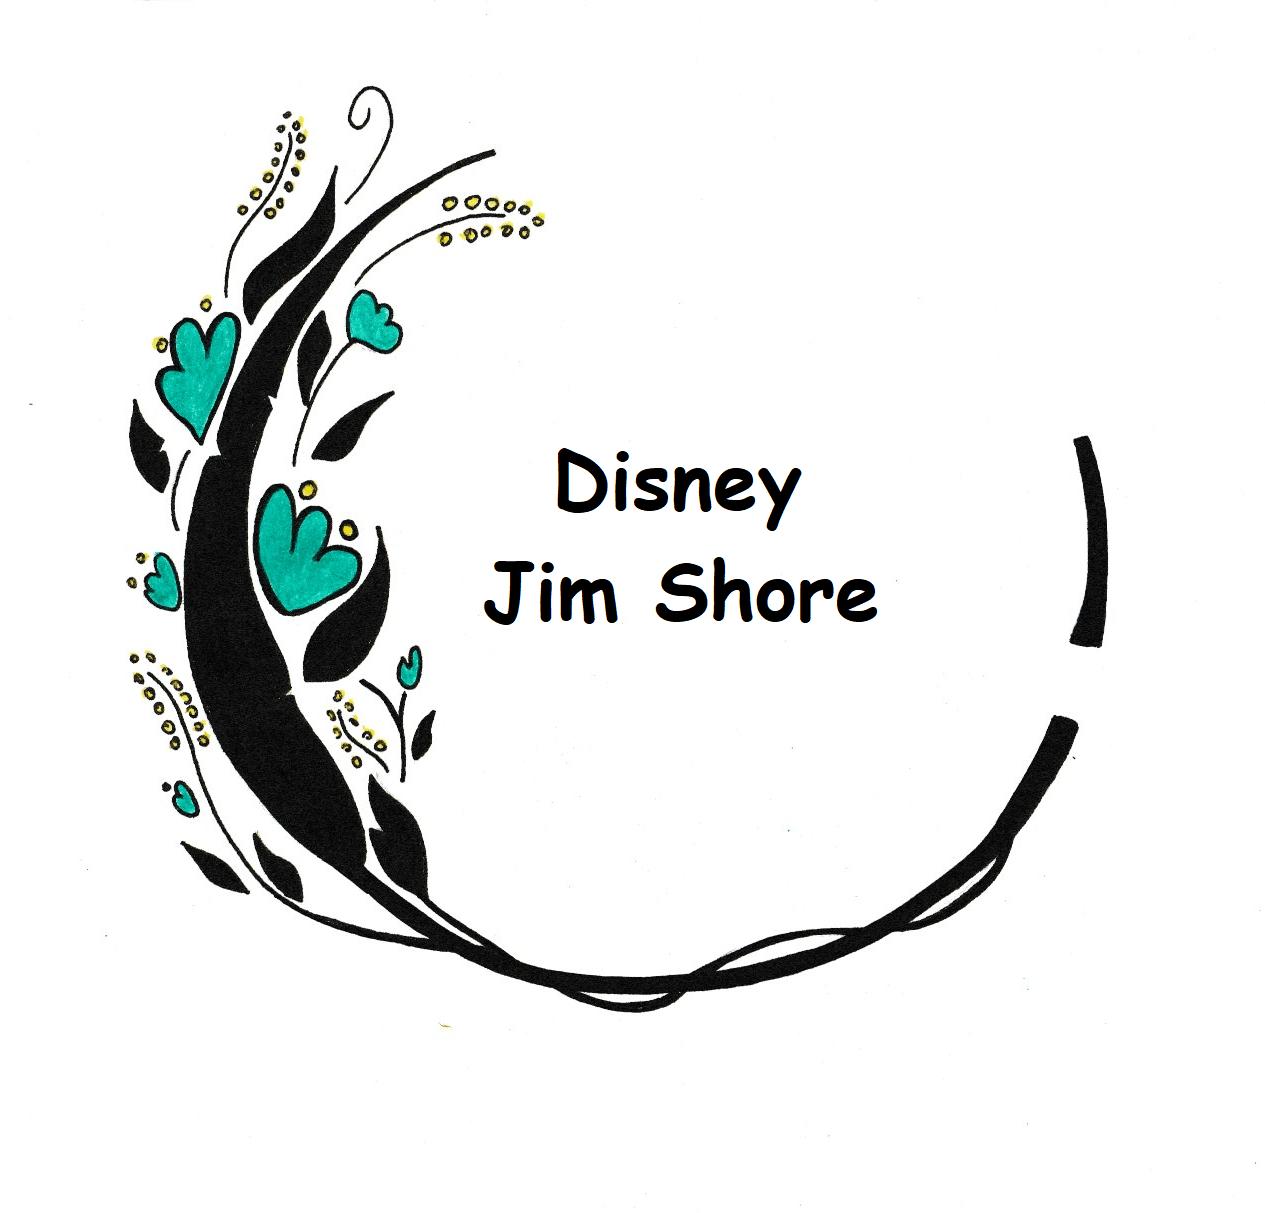 Disney Jim Shore